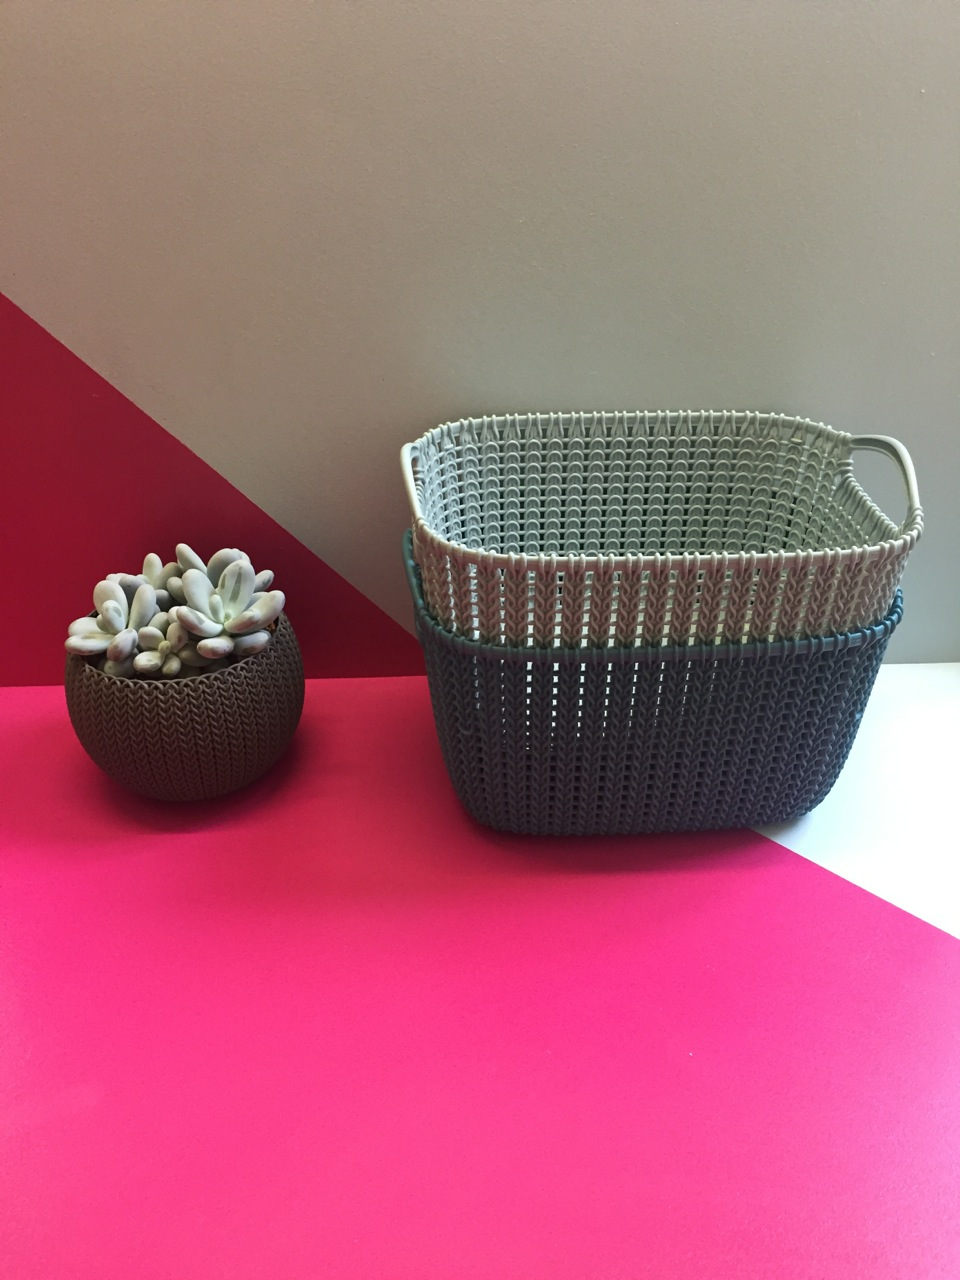 woven plant baskets